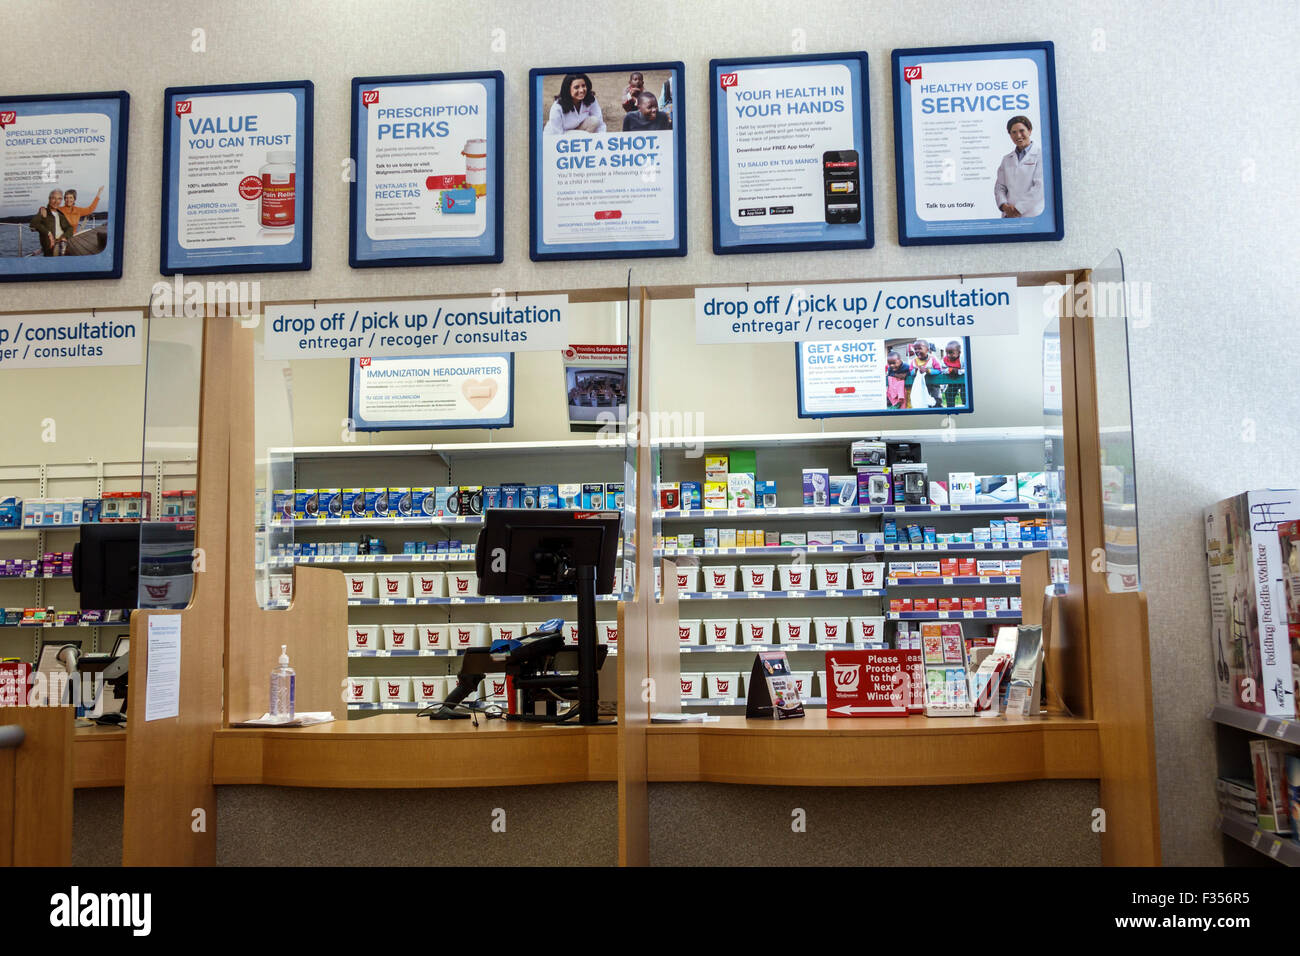 Miami Beach Florida Walgreens Pharmacy Drugstore Prescription Pick Up Stock Photo Royalty Free